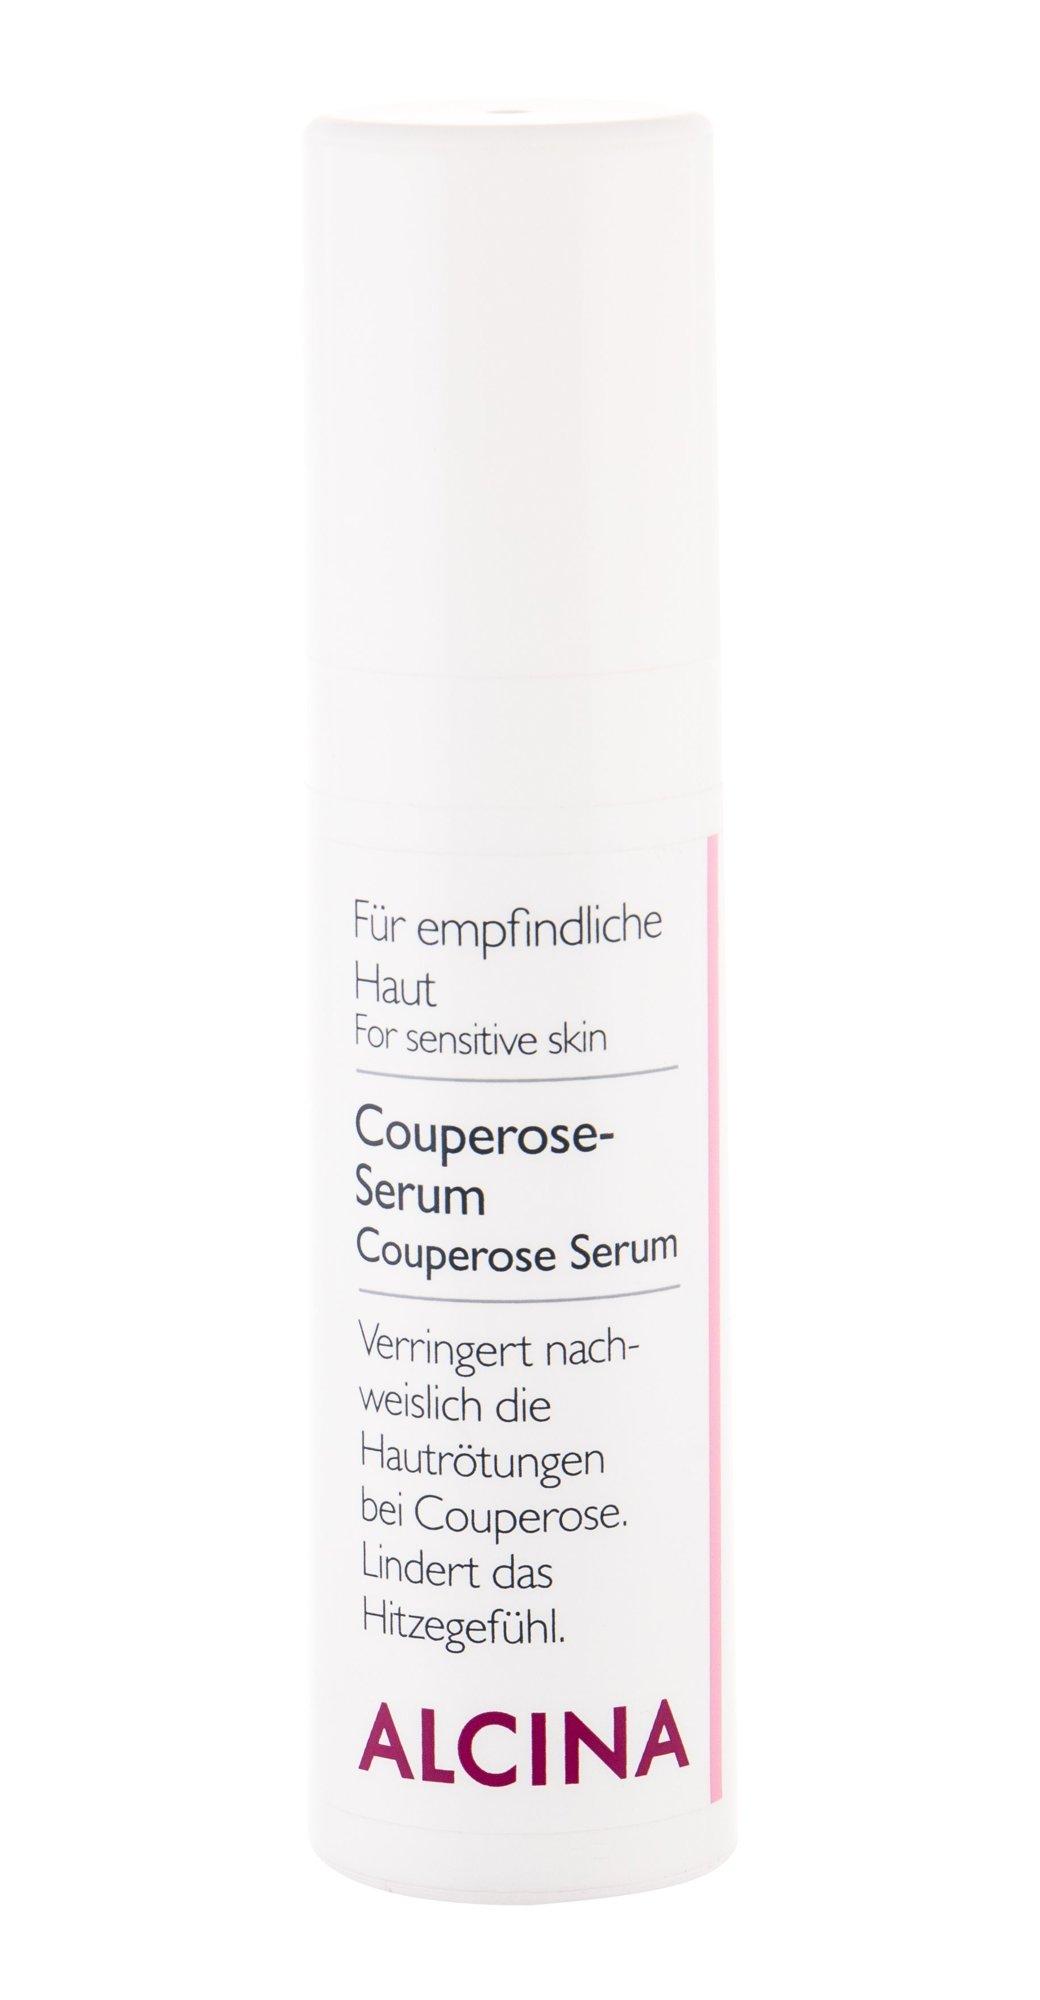 ALCINA Couperose Skin Serum 30ml